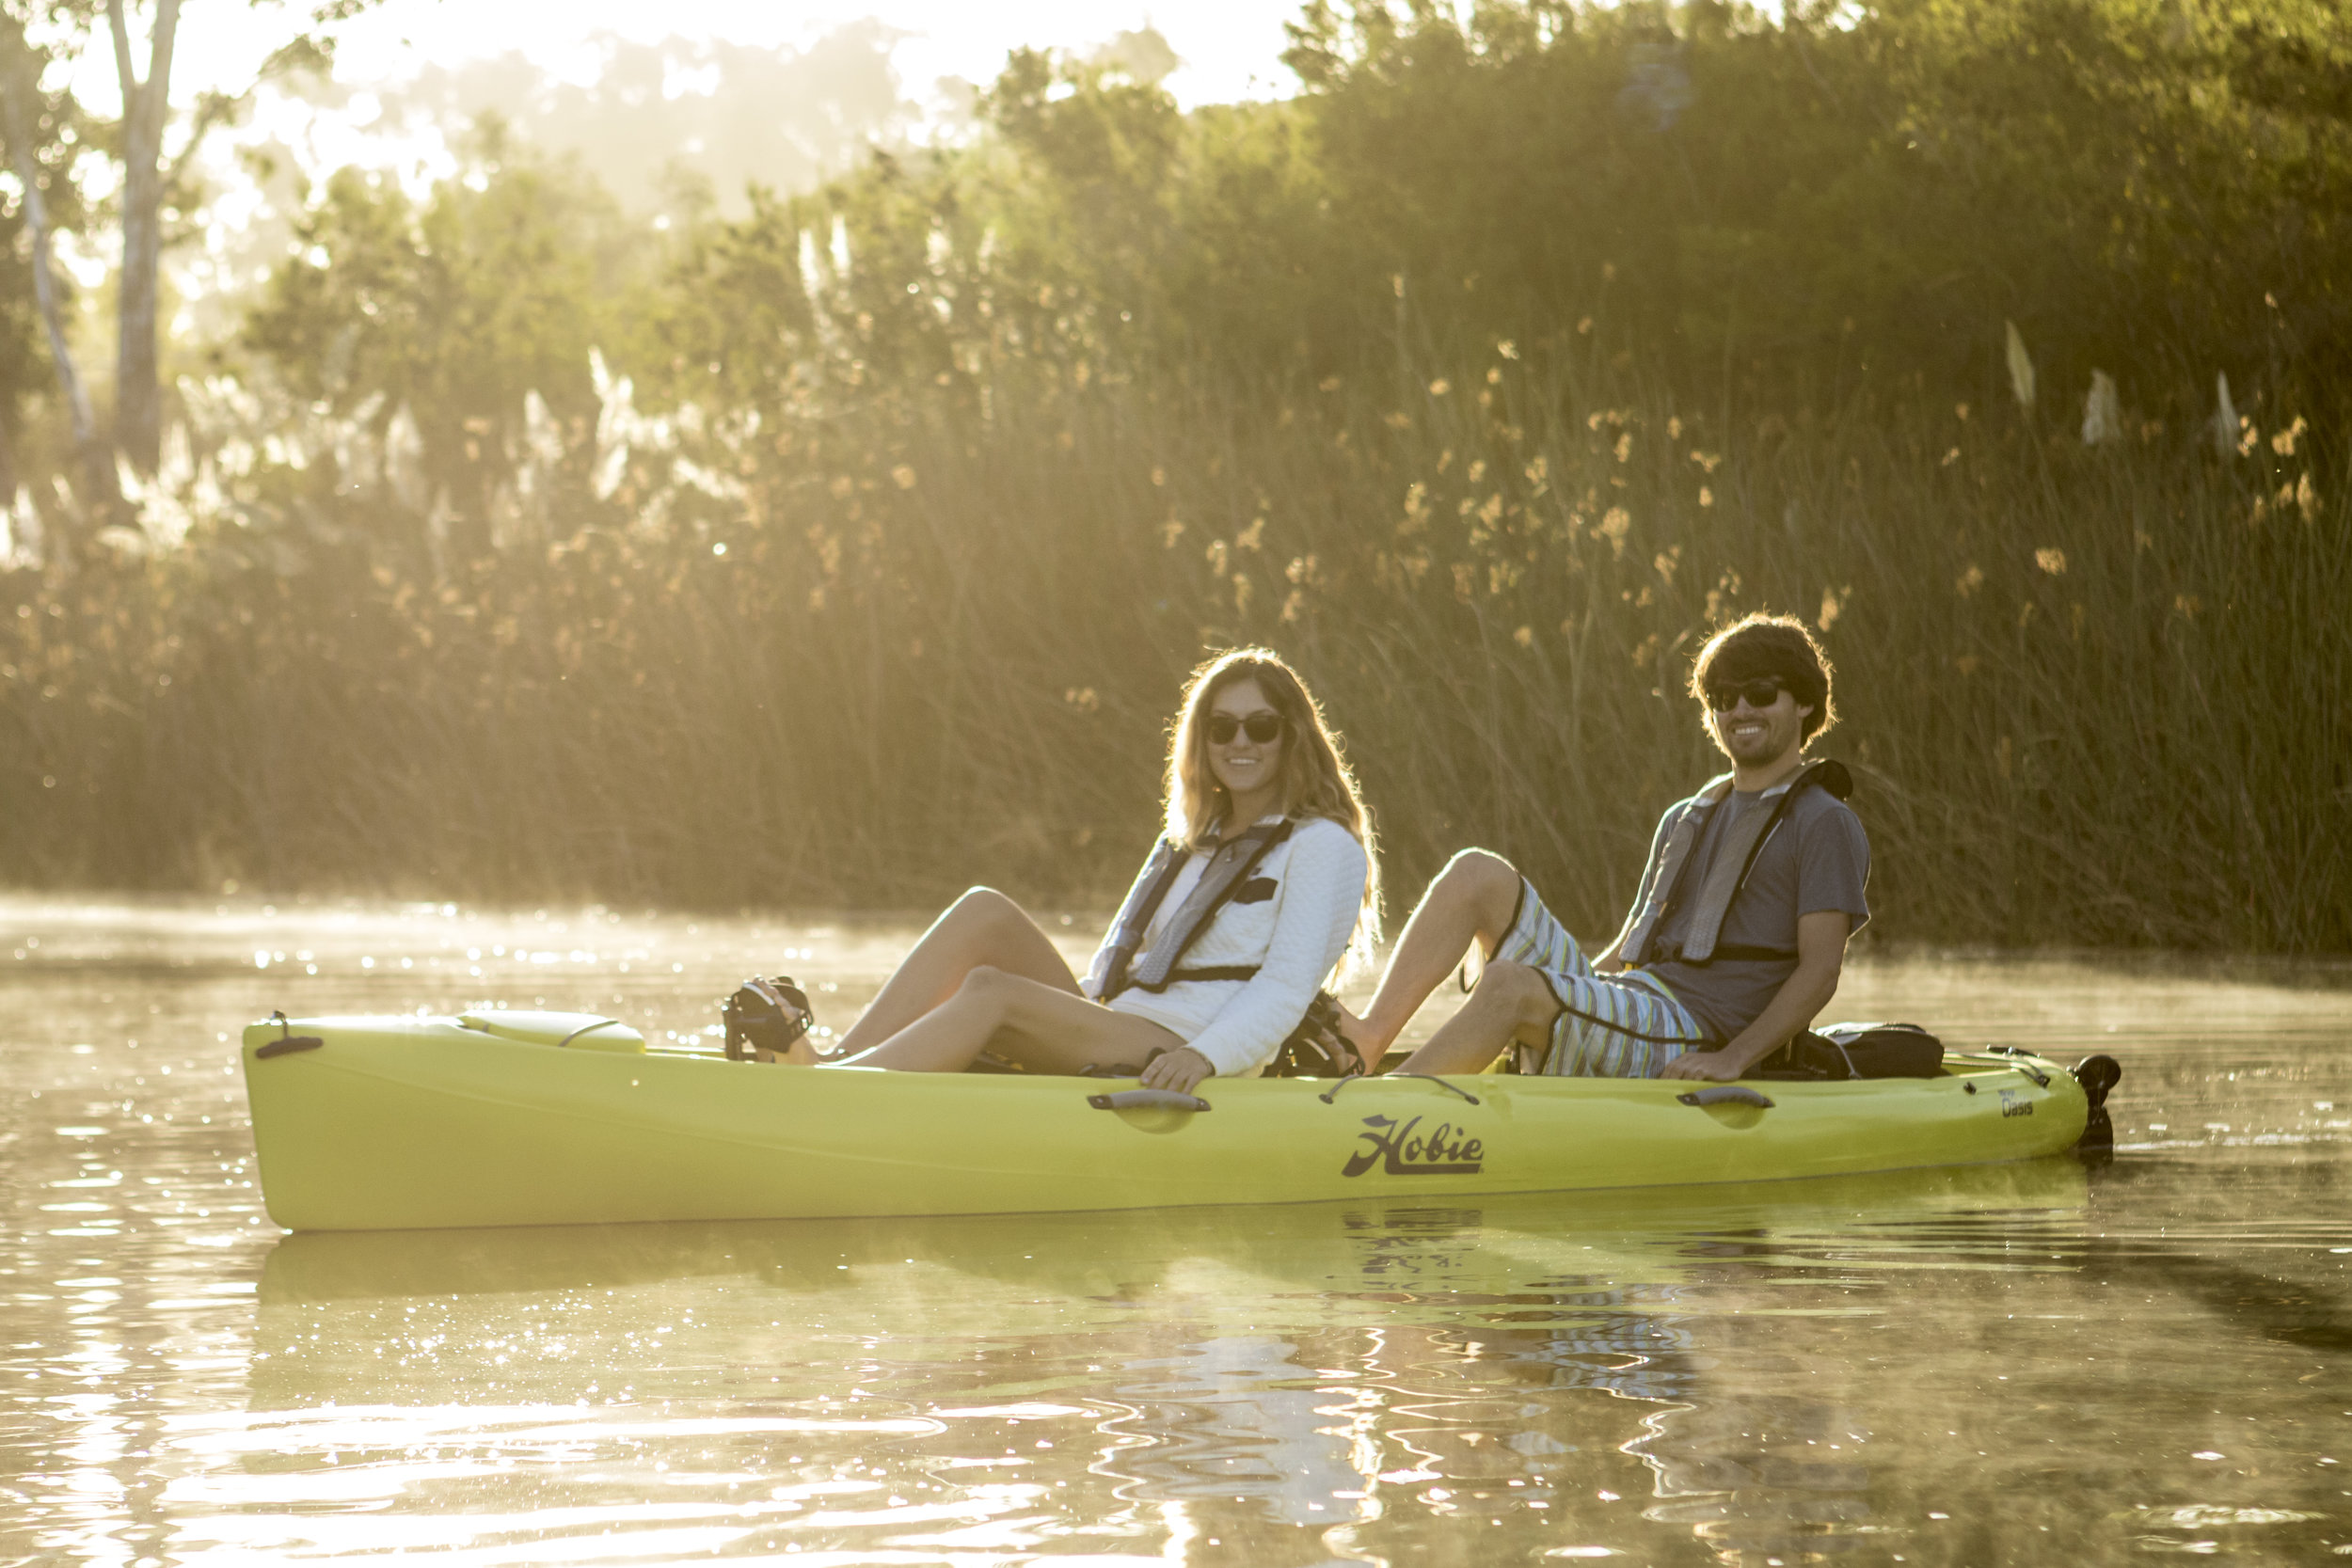 Oasis_action_sunrise_seagrass_JT_couple_lake.jpg